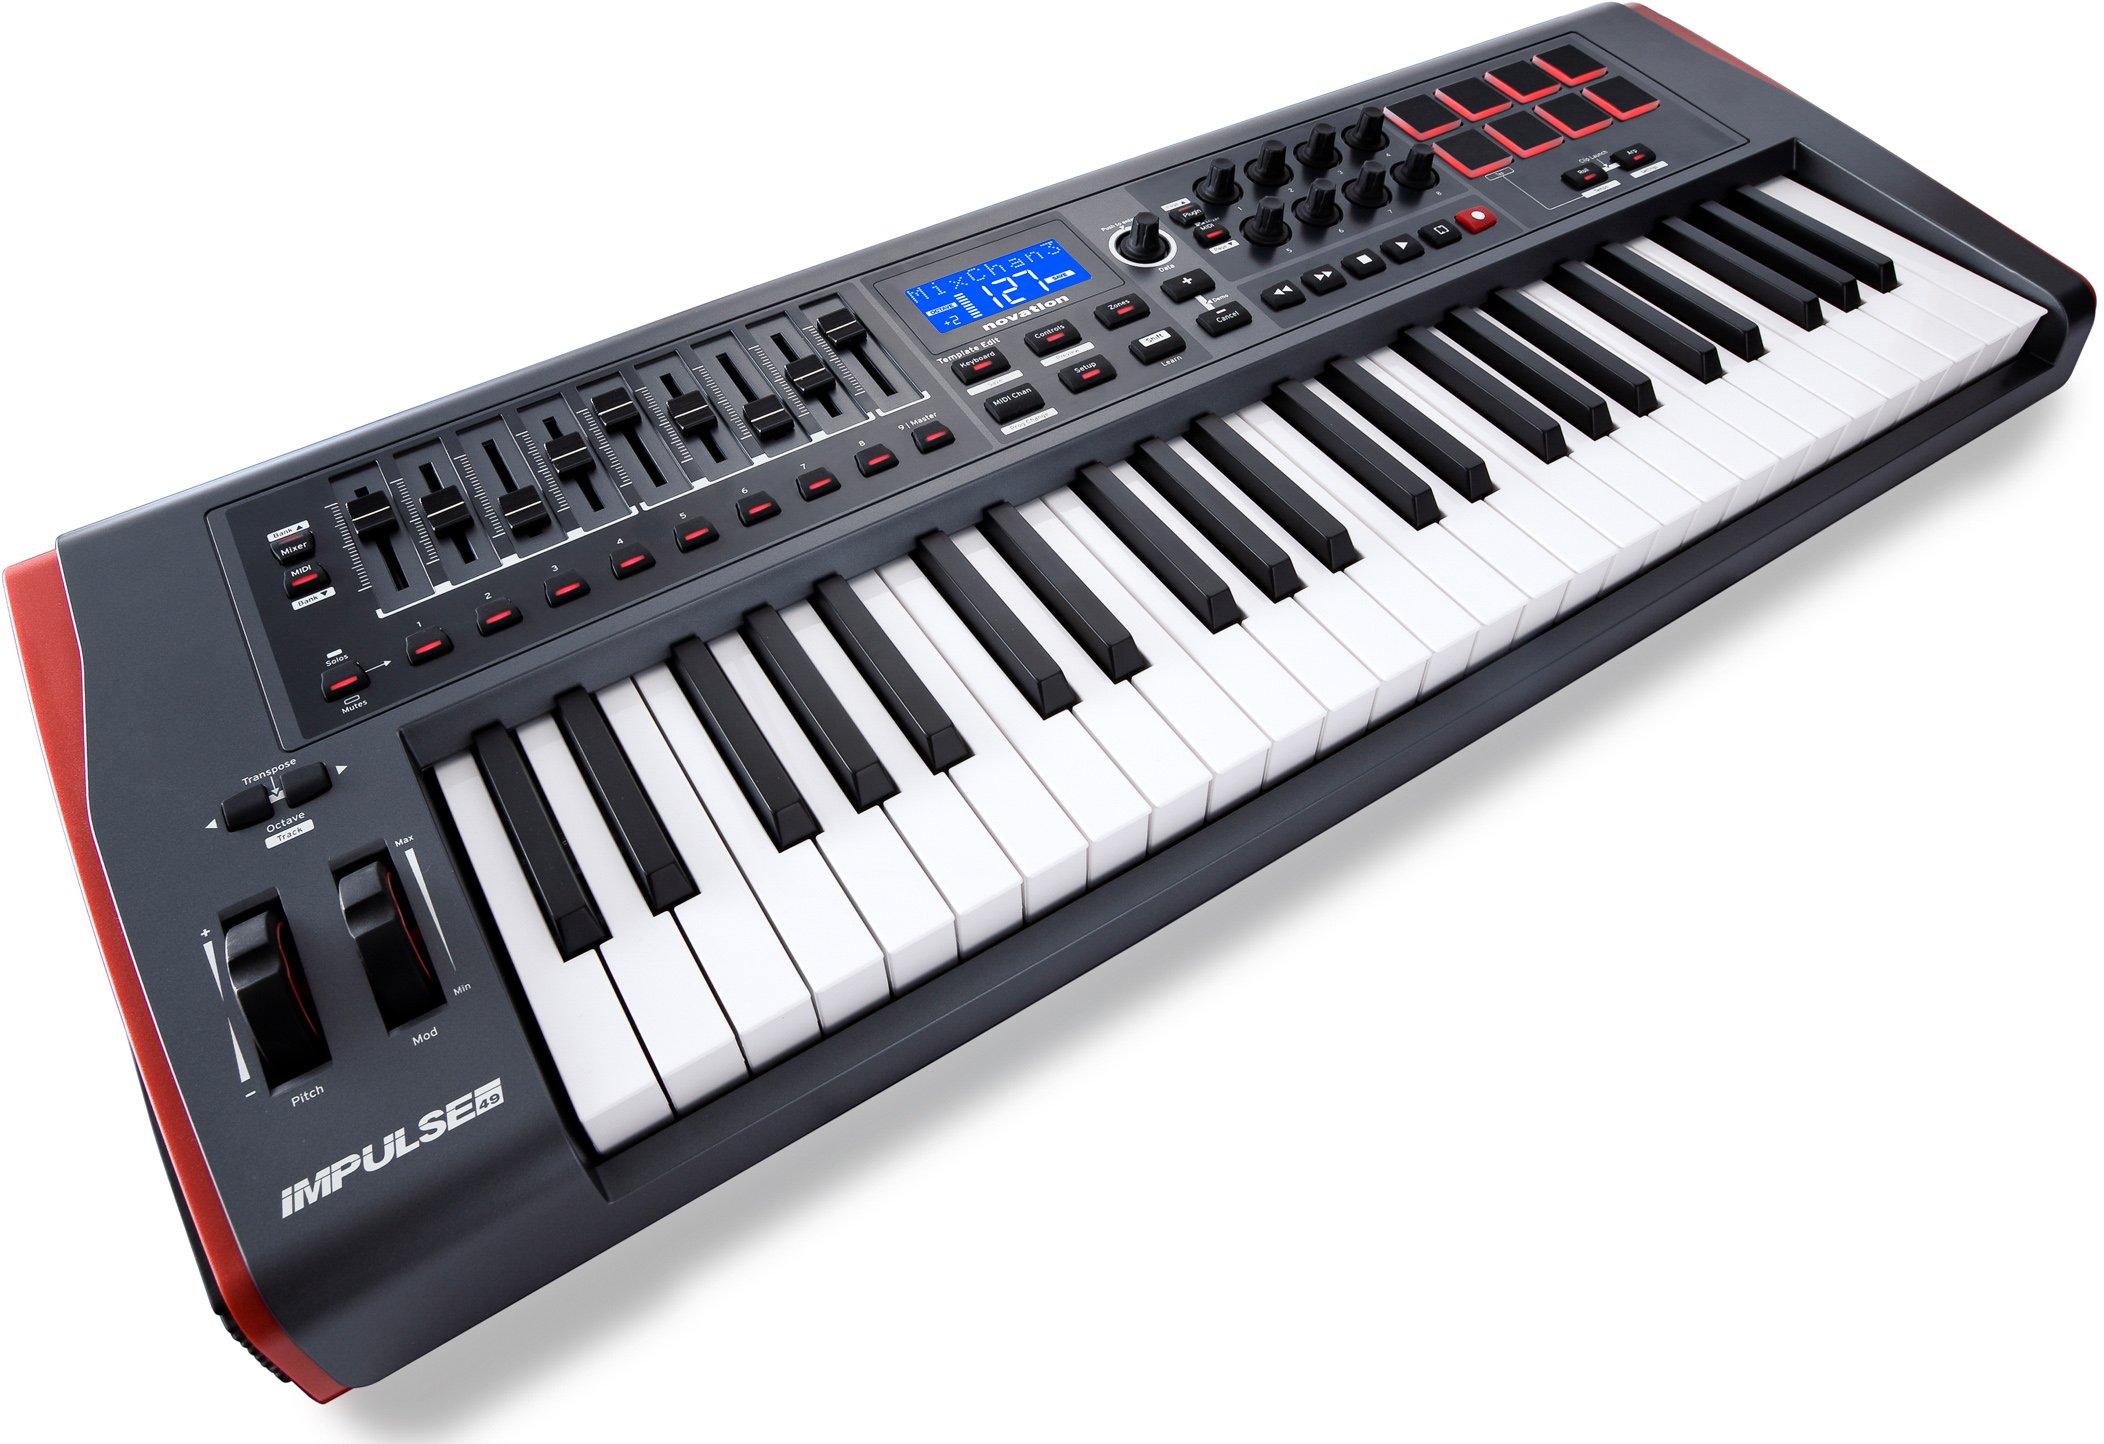 Novation Impulse 49 Keyboard Bundle with MIDI Cables and Austin Bazaar Polishing Cloth by Novation (Image #3)